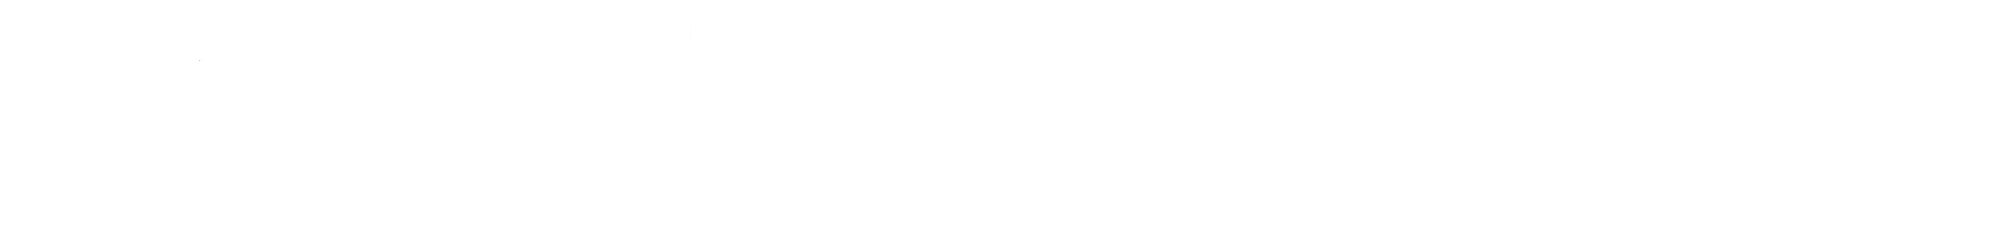 Ostrava bila